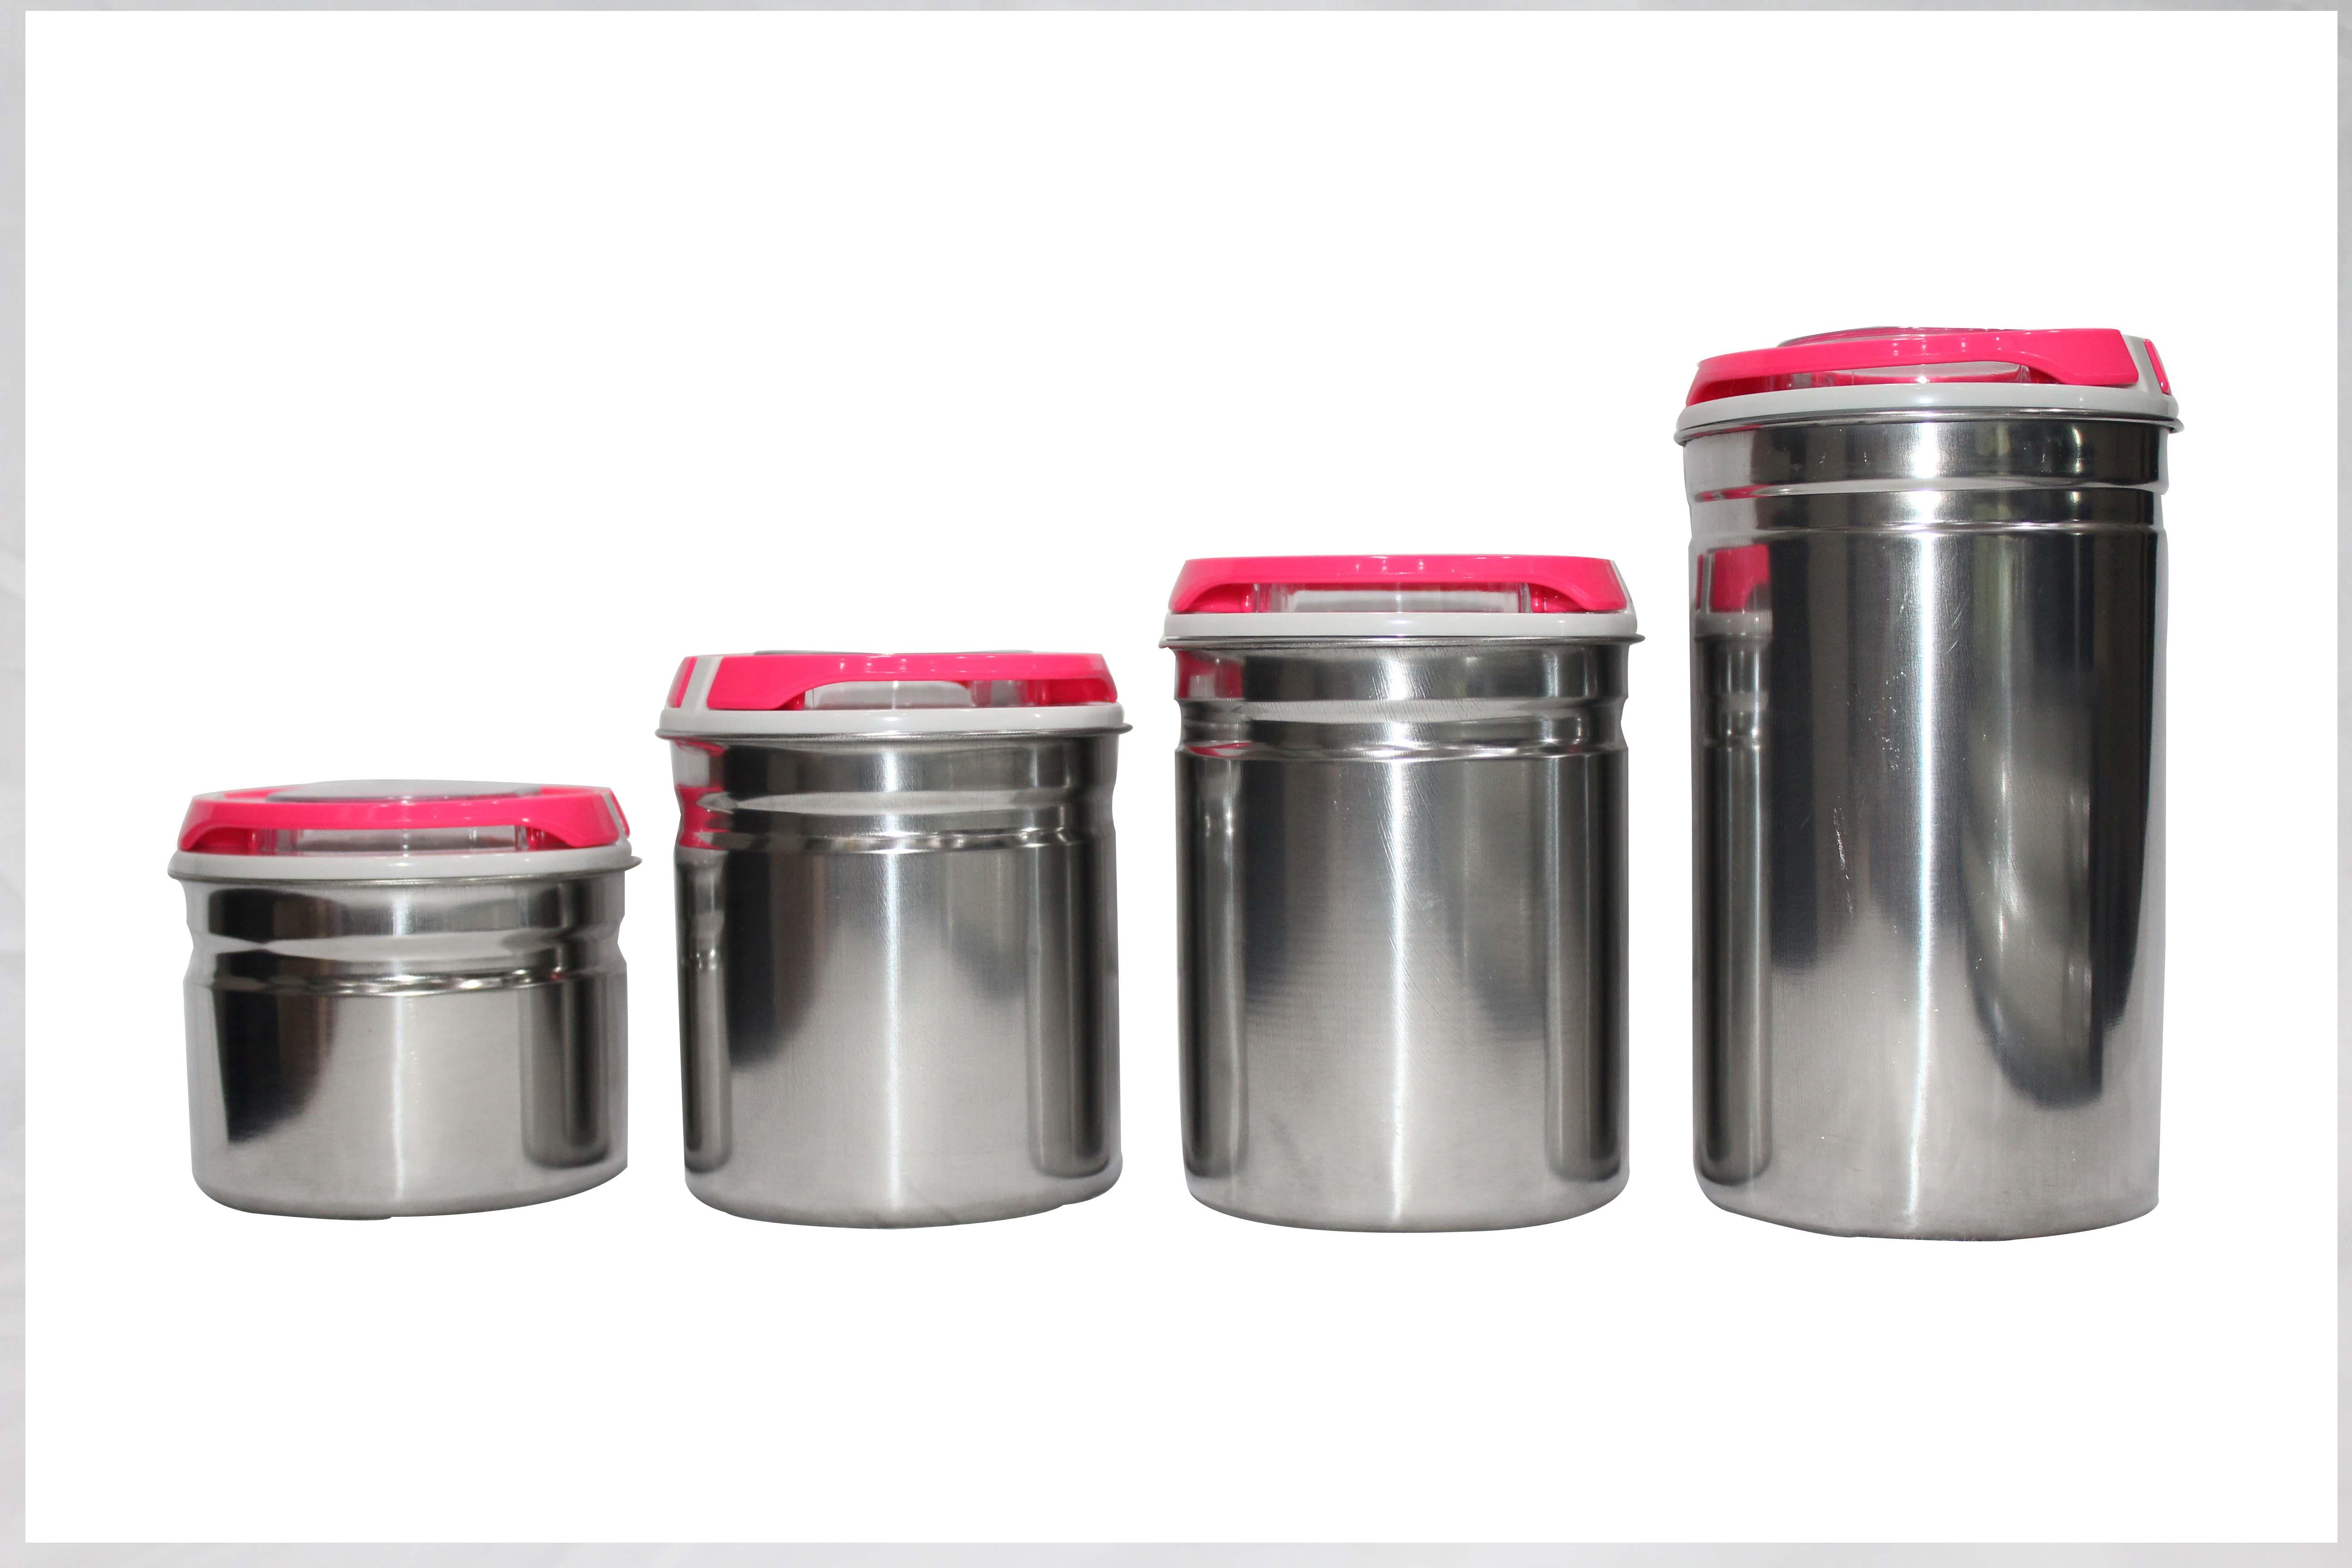 Blue Birds - 1000 ml, 800 ml, 500 ml, 300 ml Stainless Steel Multi-Purpose Storage Containers